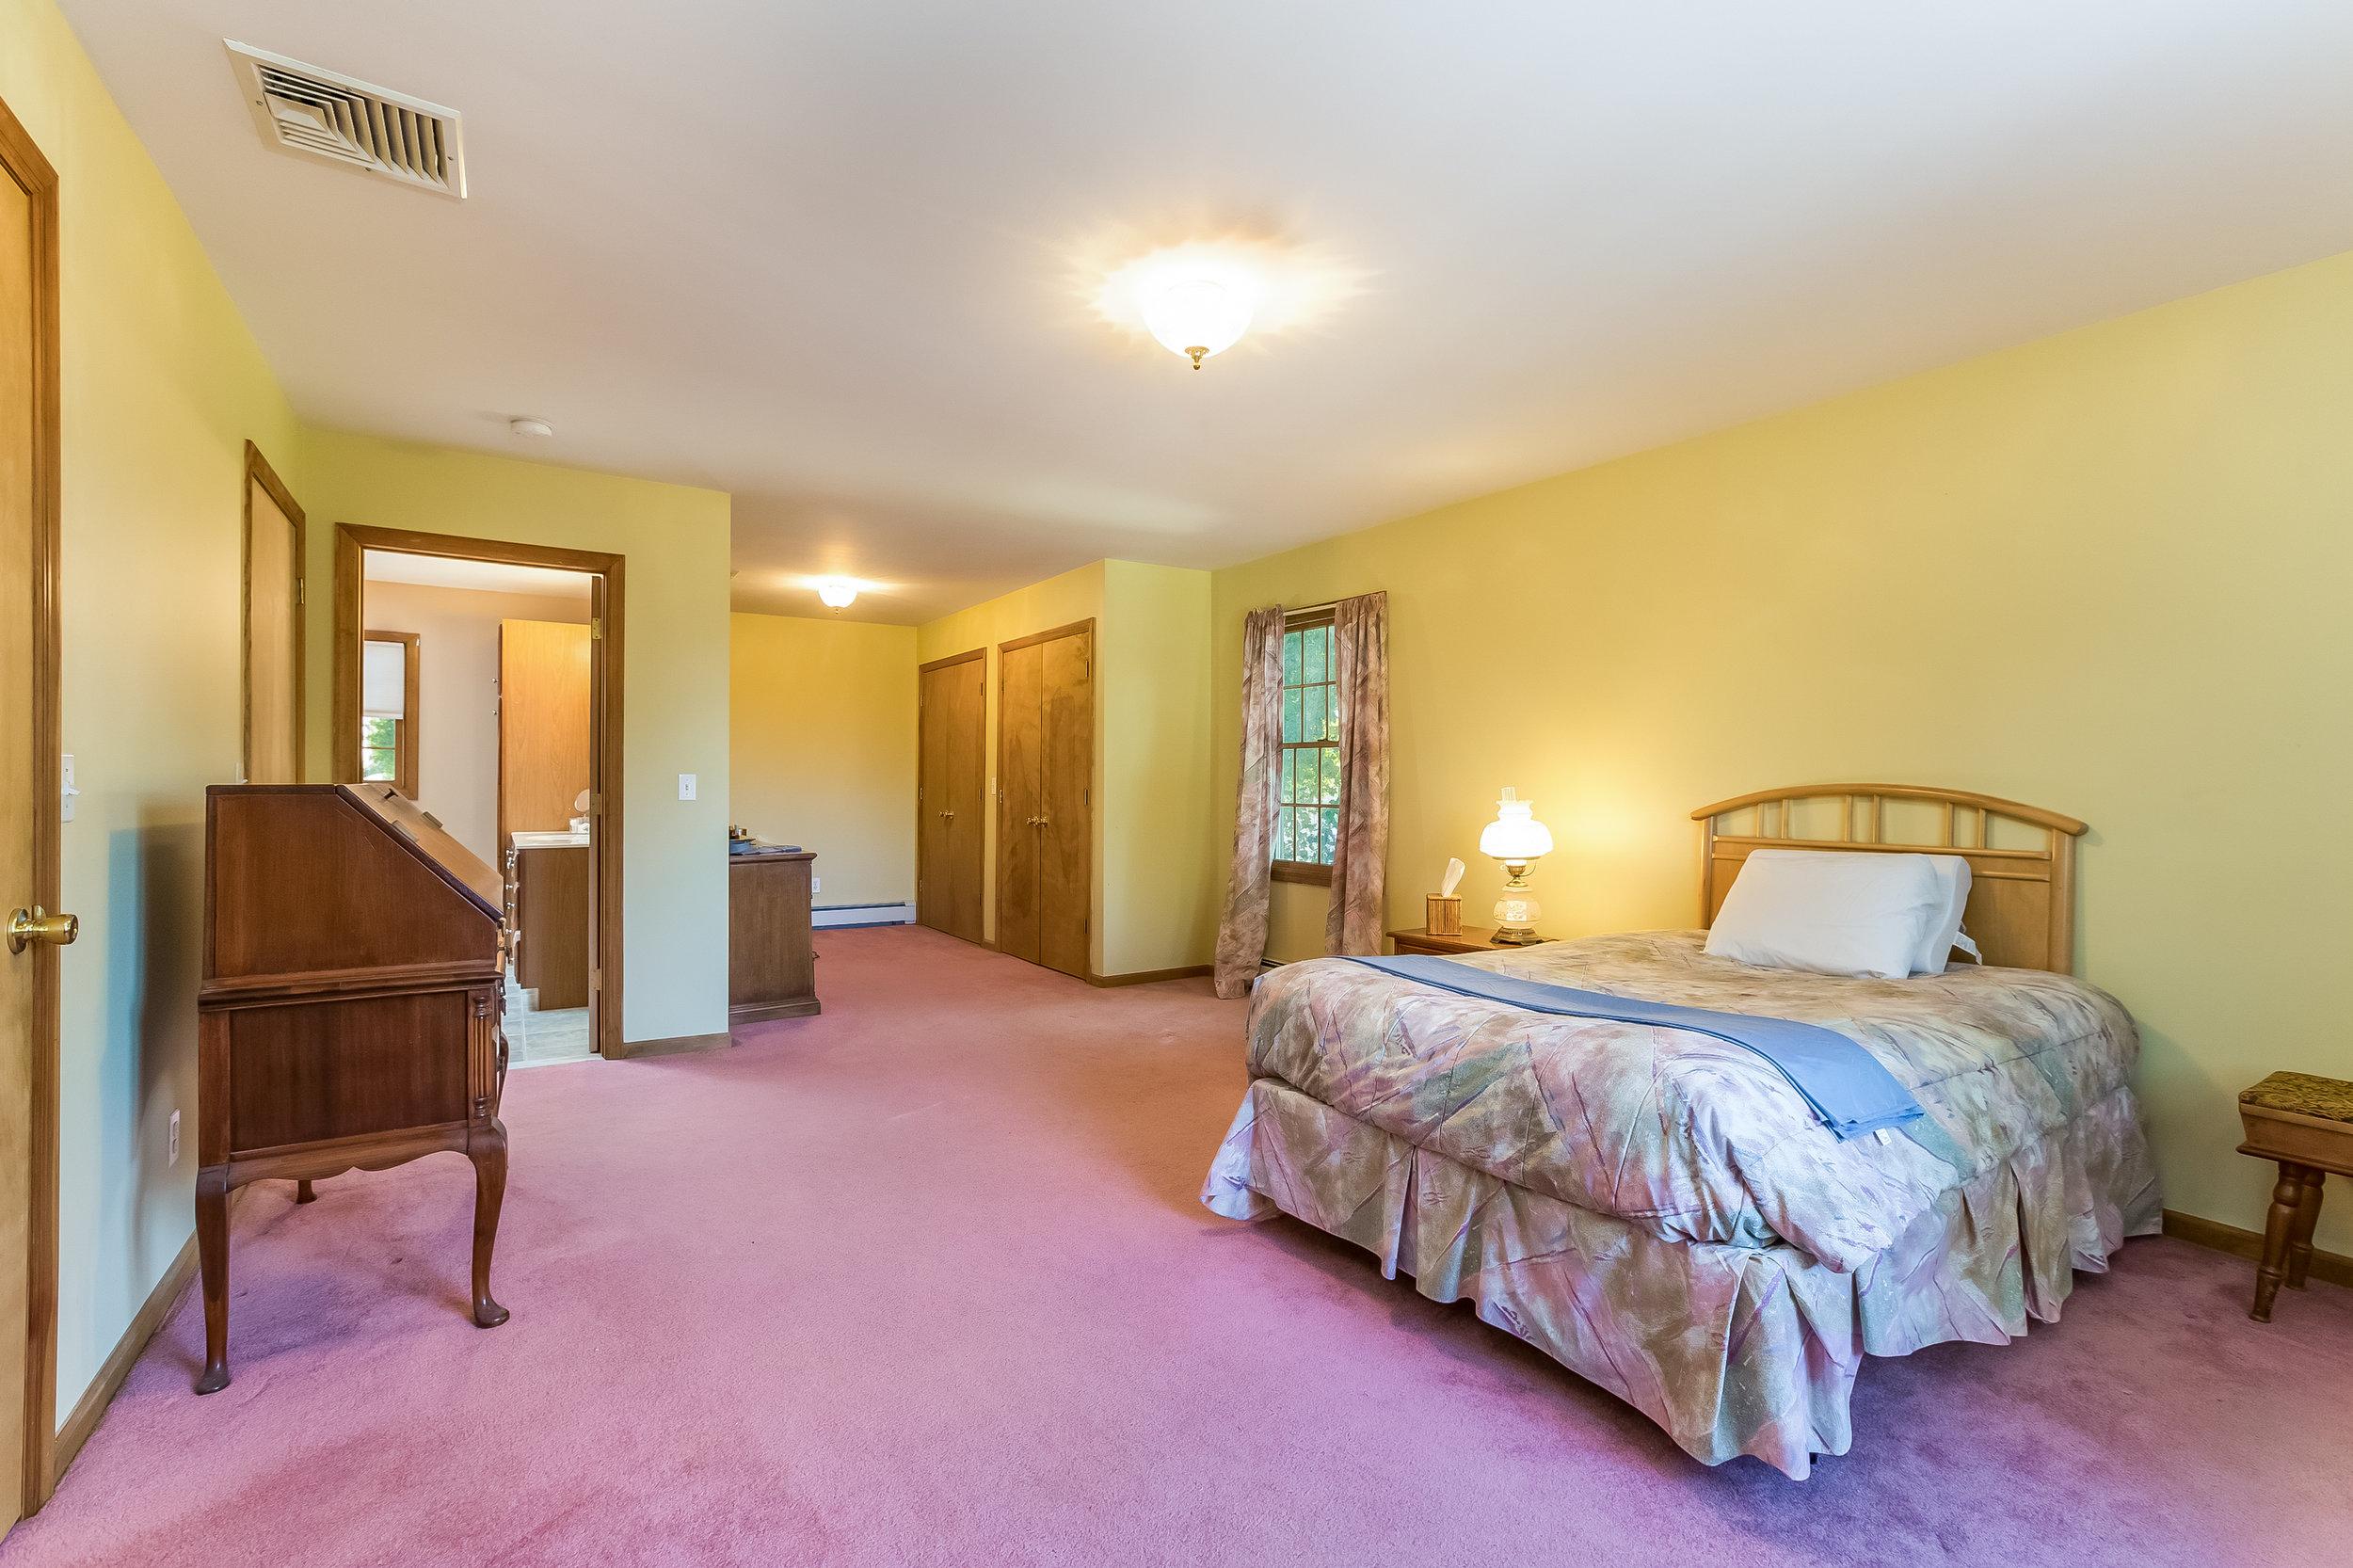 030-Master_Bedroom-5002167-large.jpg